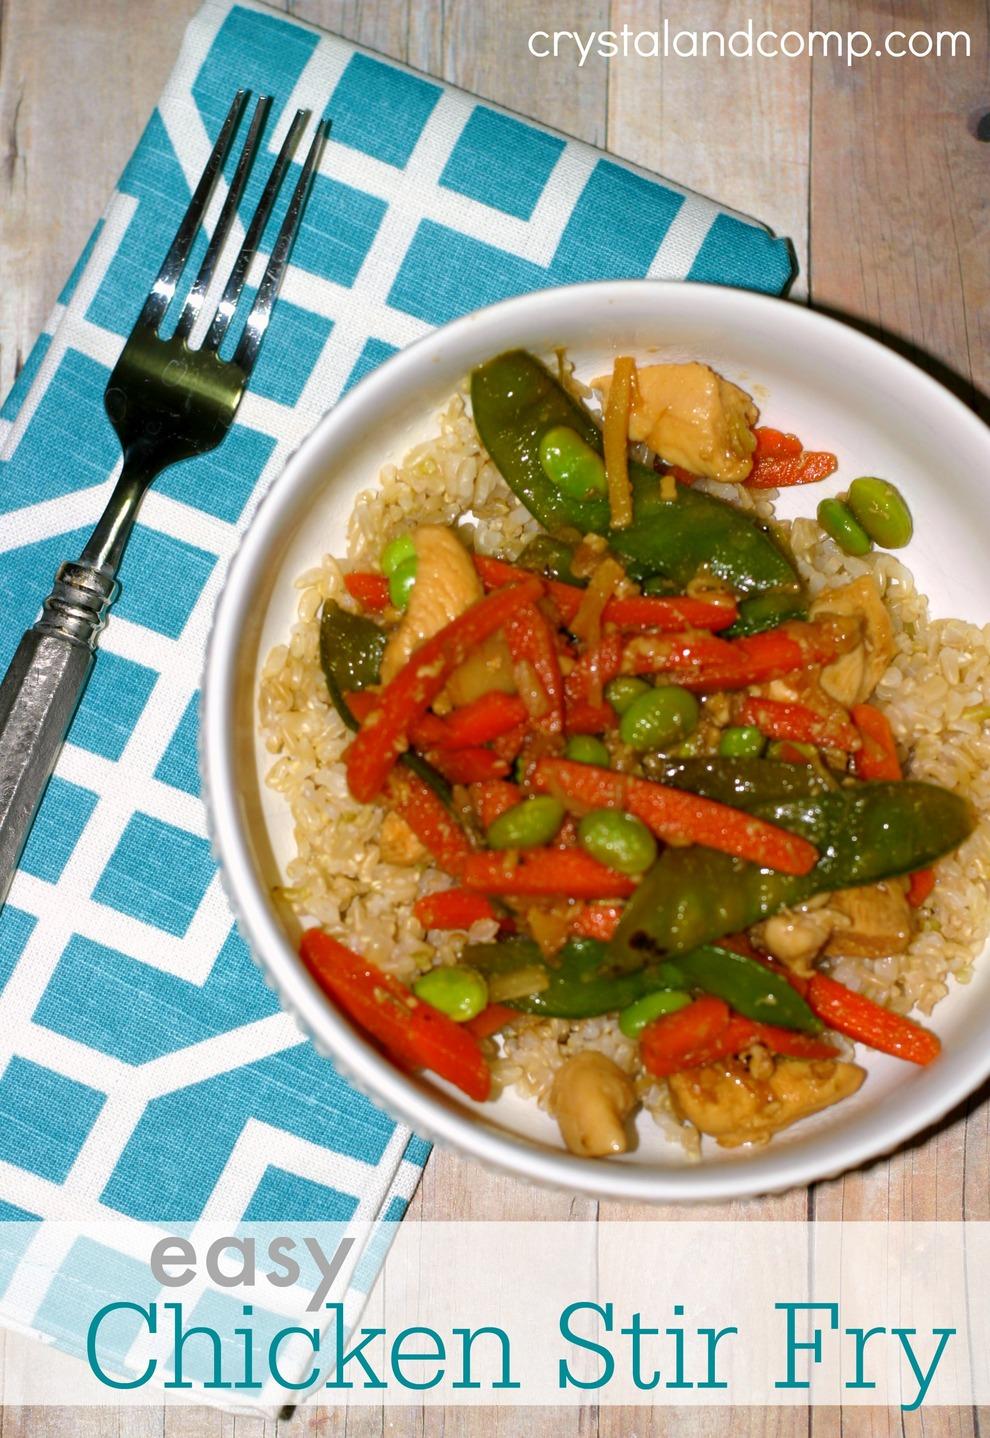 stir fry asparagus and cashew chicken stir fry easy chicken stir fry ...